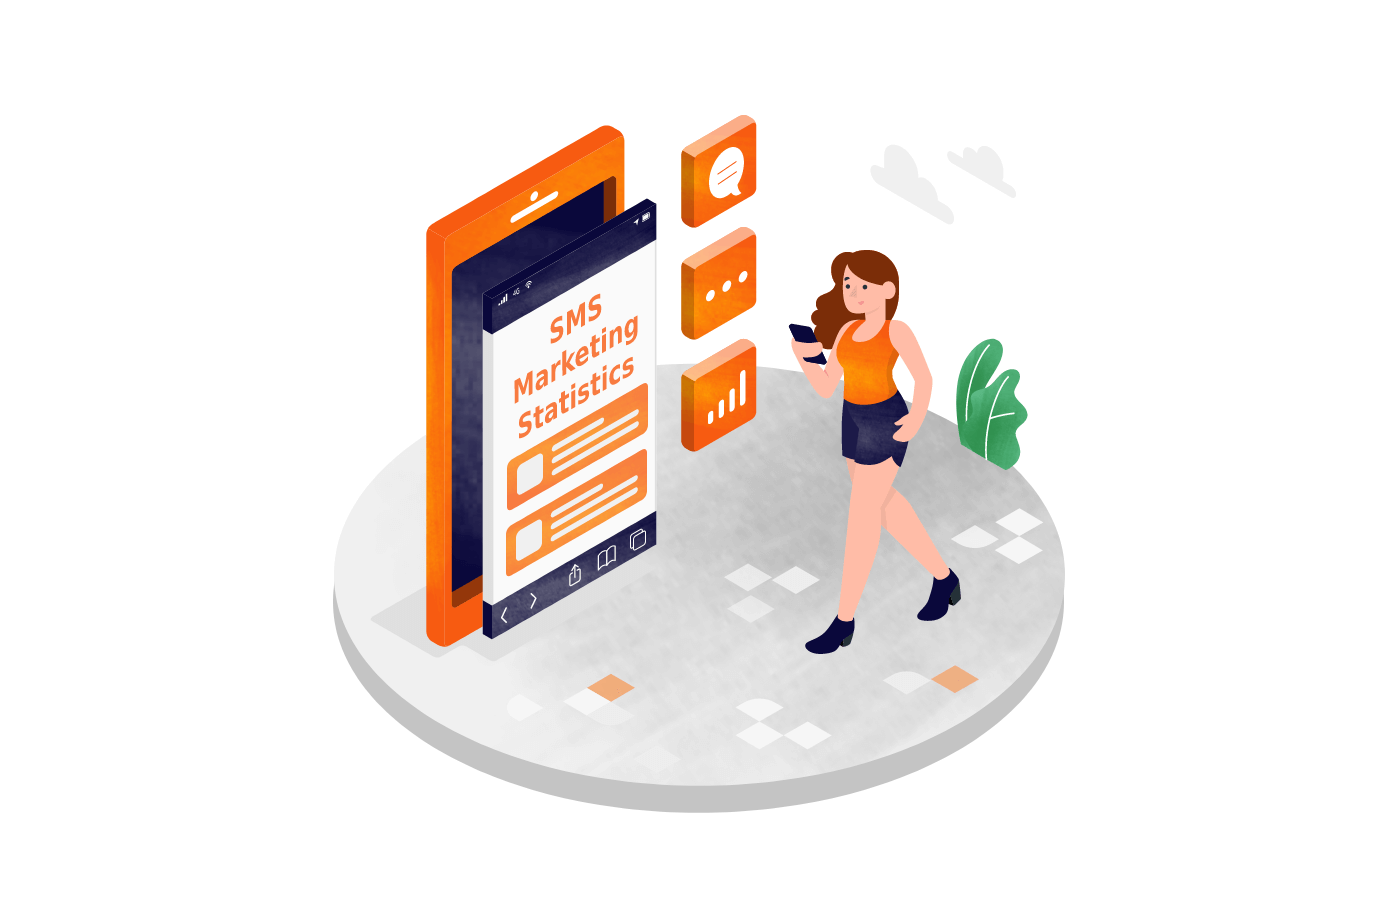 sms_marketing_statistics